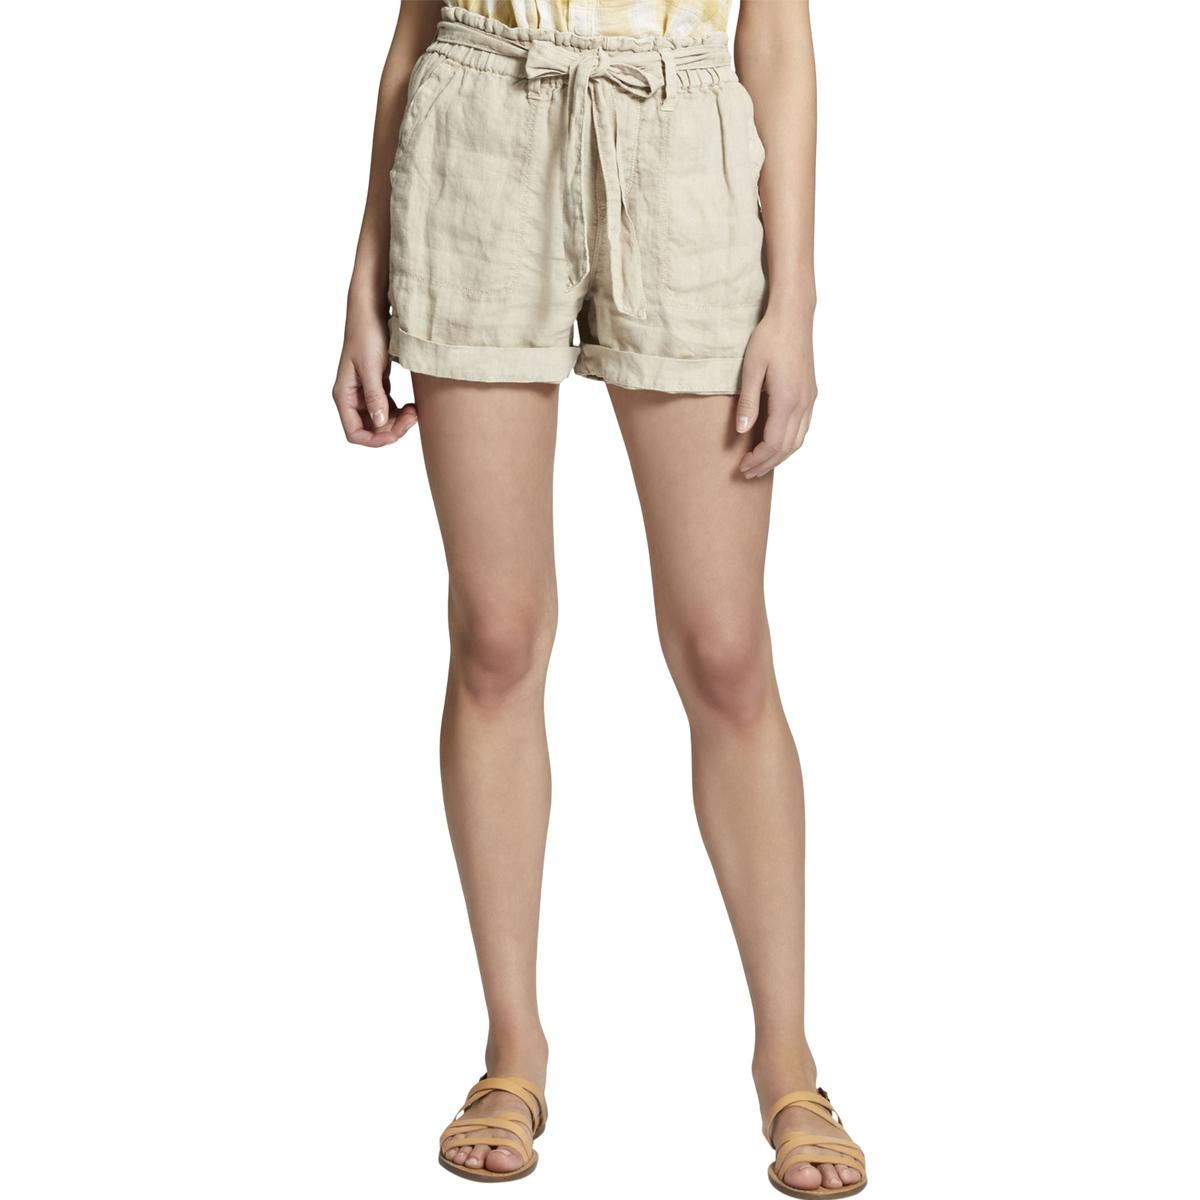 Sanctuary Womens Beige Linen Beach Summer Casual Shorts XS BHFO 2827